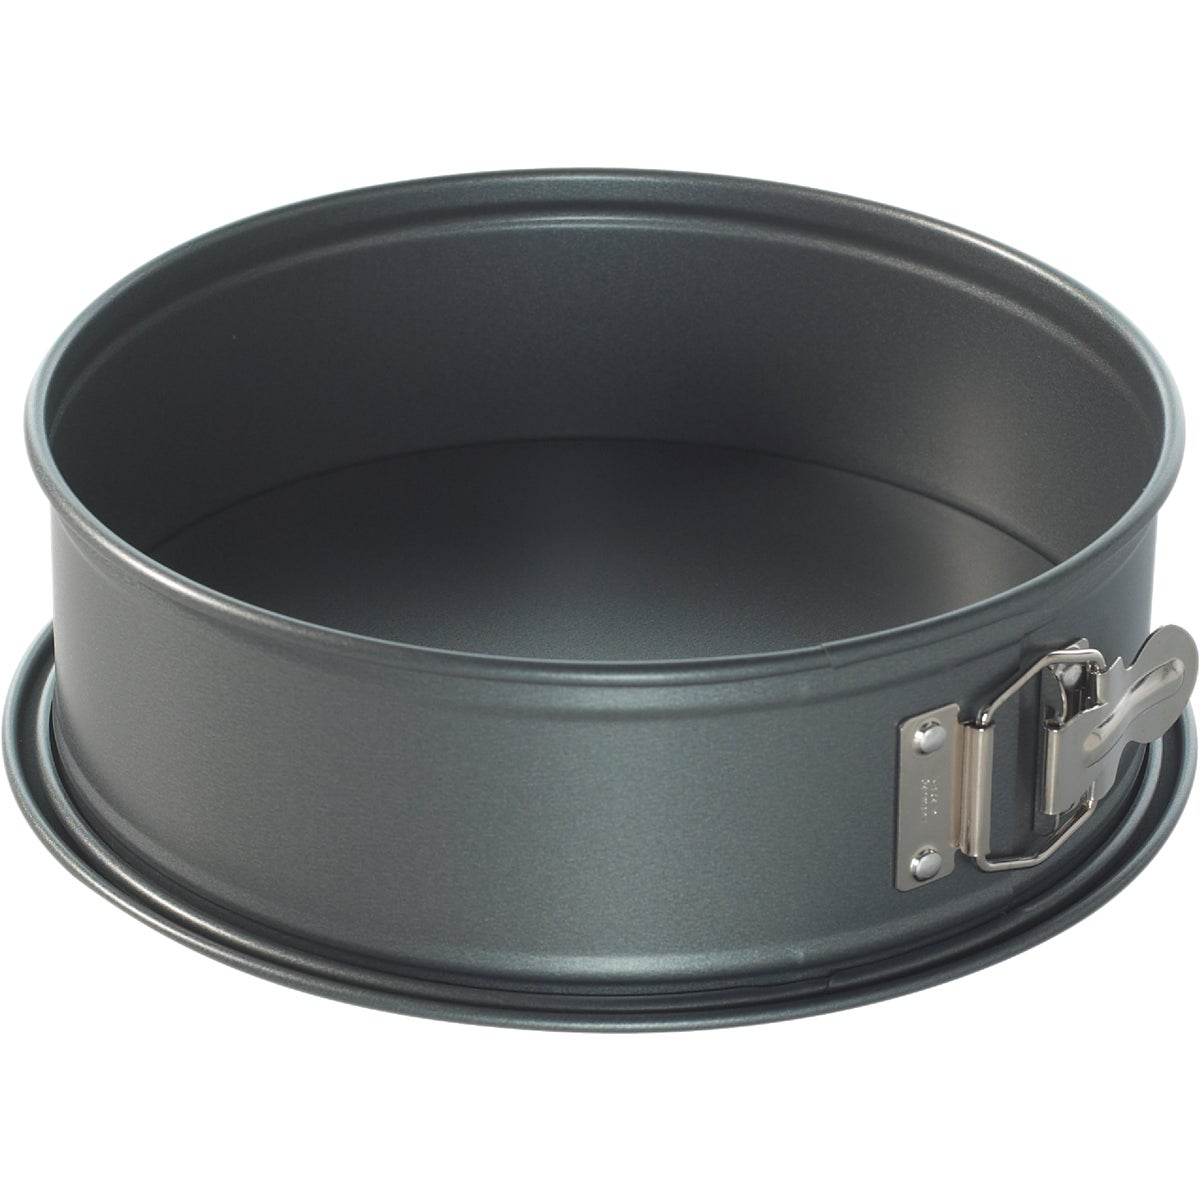 "9"" SPRINGFORM PAN - 55742 by Nordic Ware/reitenba"